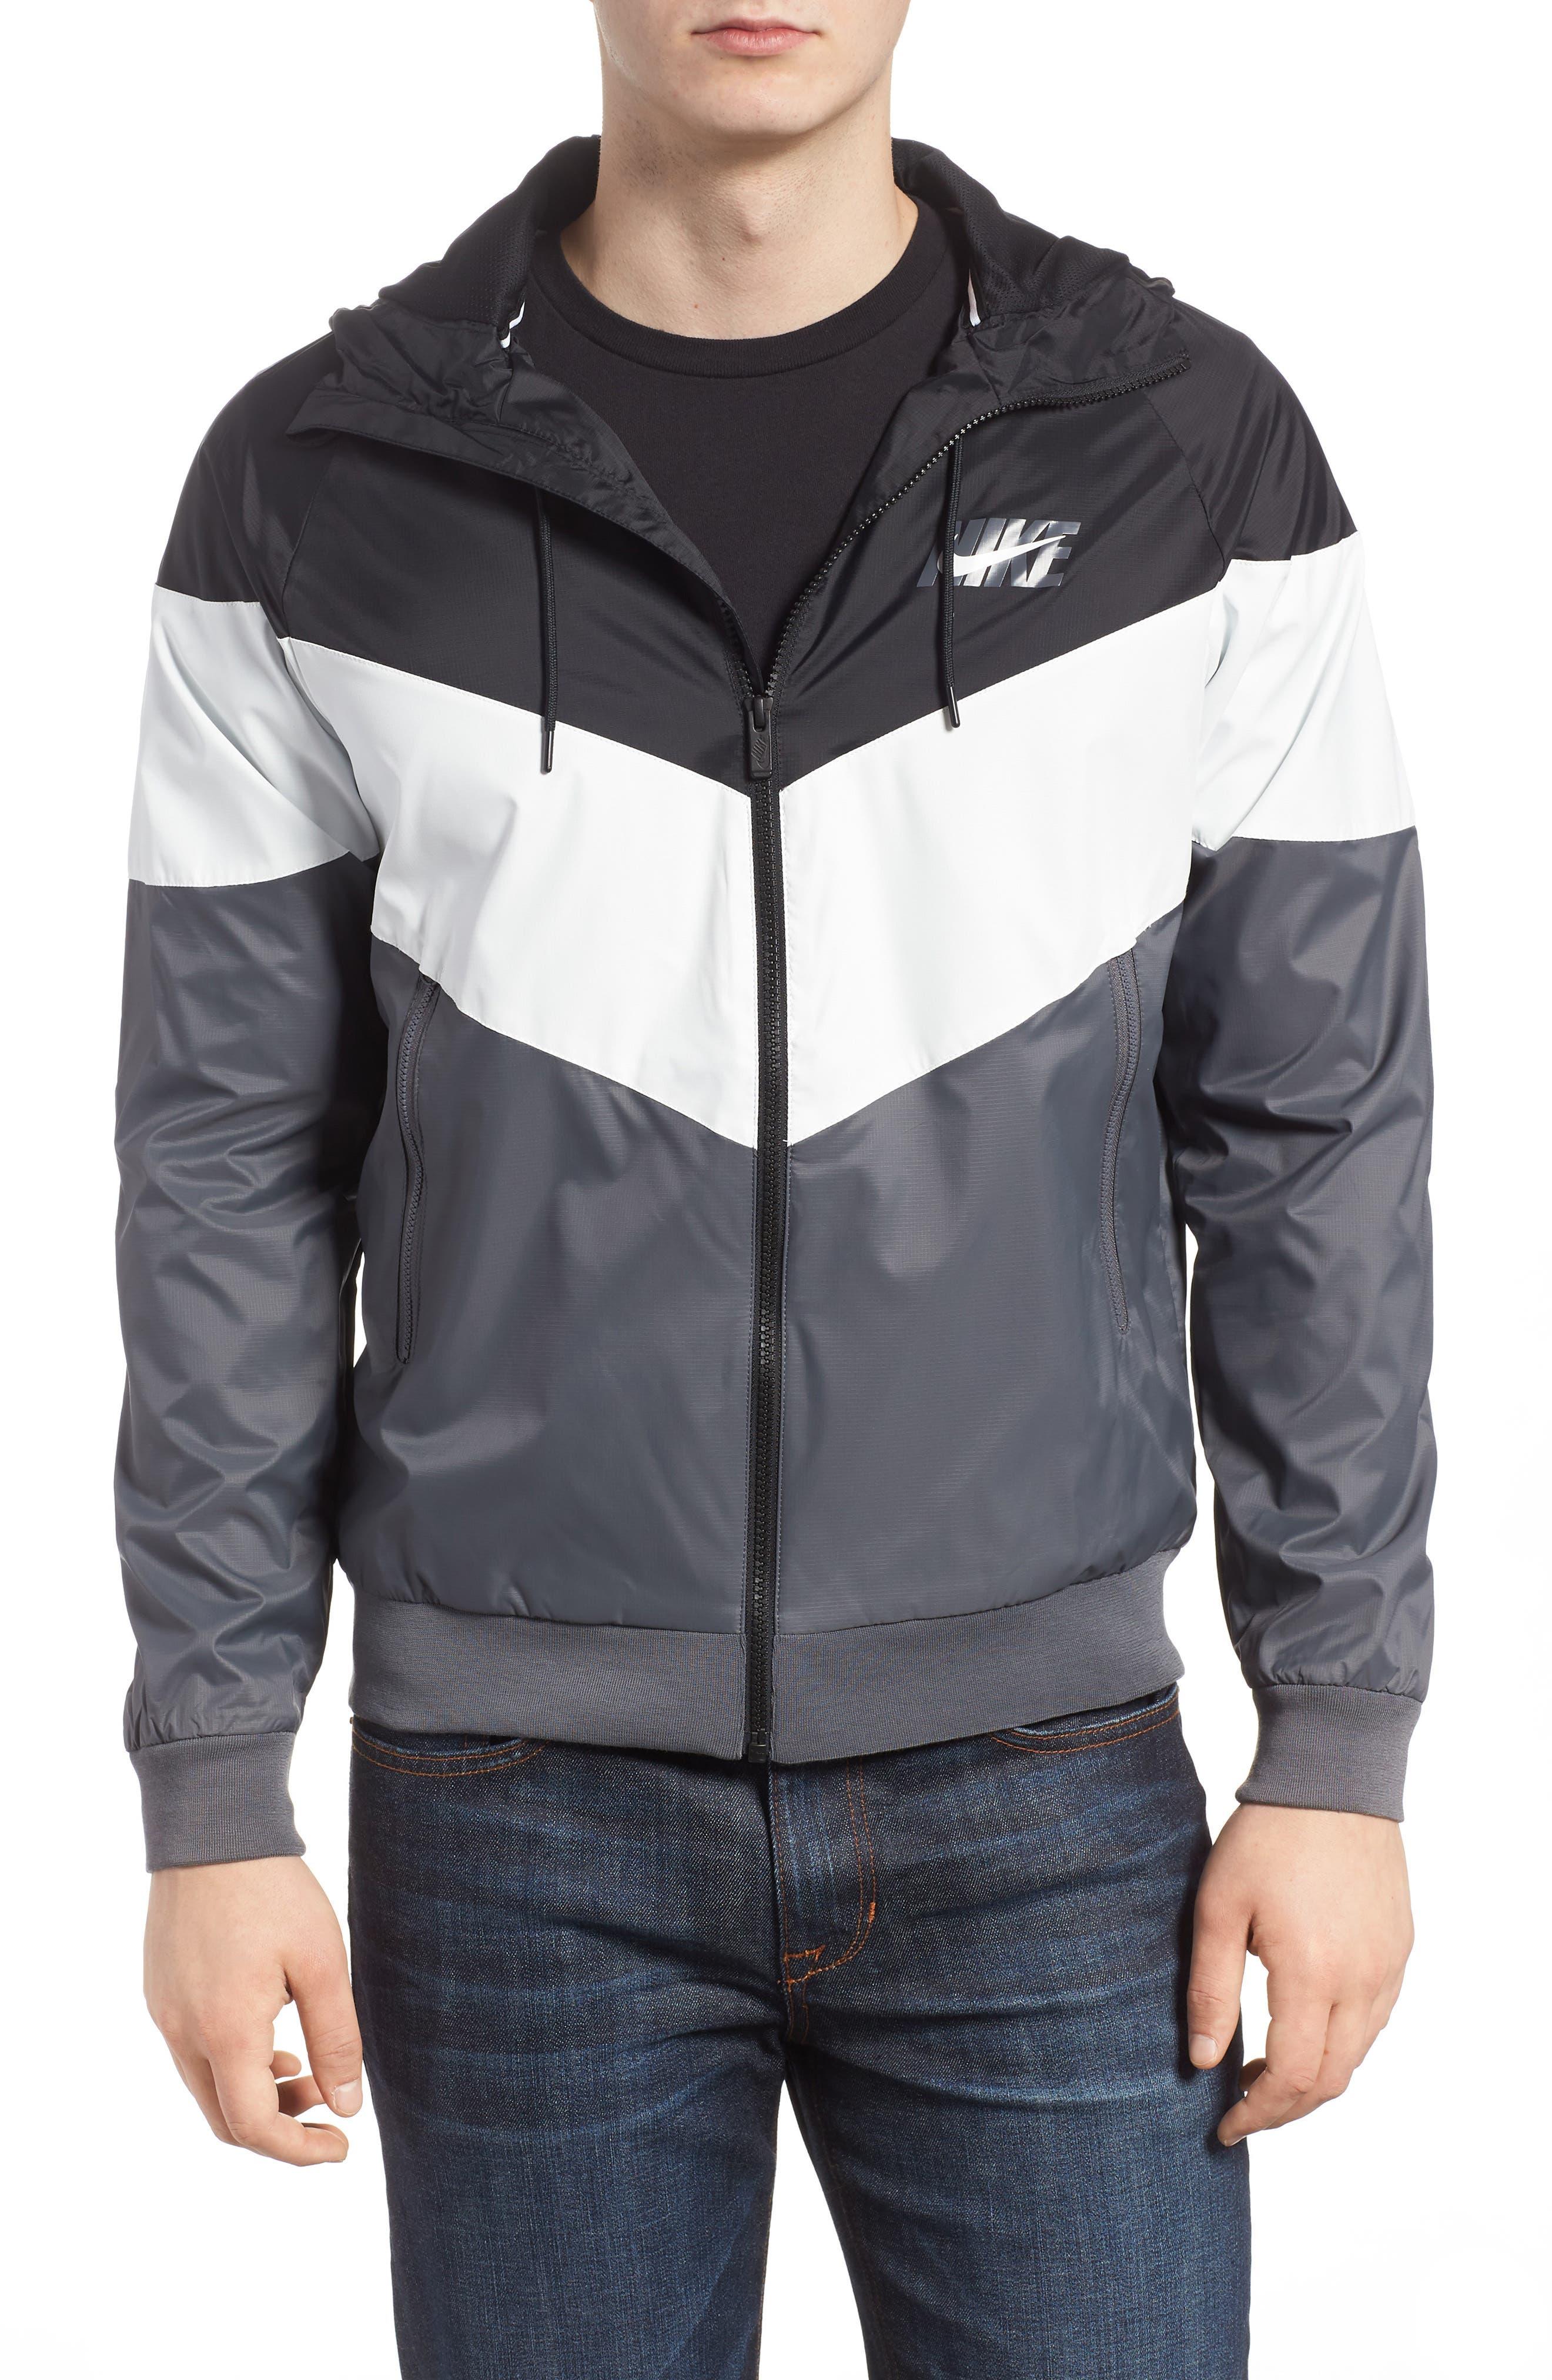 Windrunner Wind & Water Repellent Hooded Jacket,                         Main,                         color, Black/ Summit White/ Dark Grey